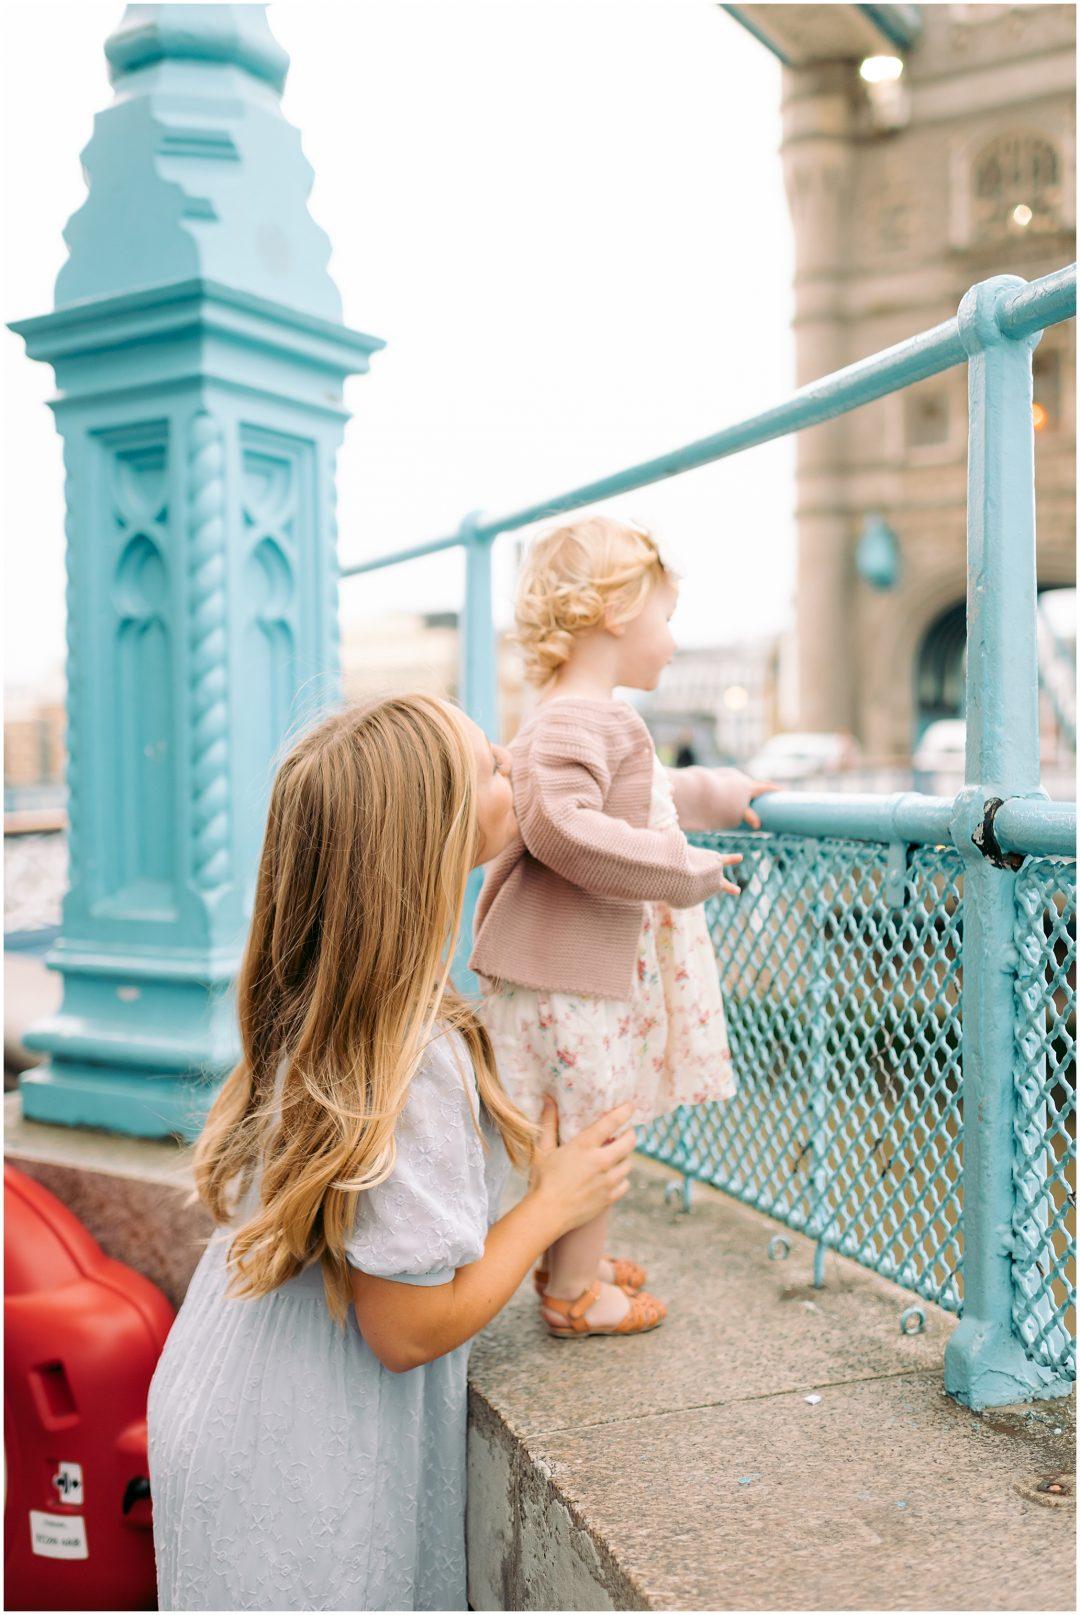 London family photographer, Tower Bridge family shoot, Nkimaphotography_0013.jpg